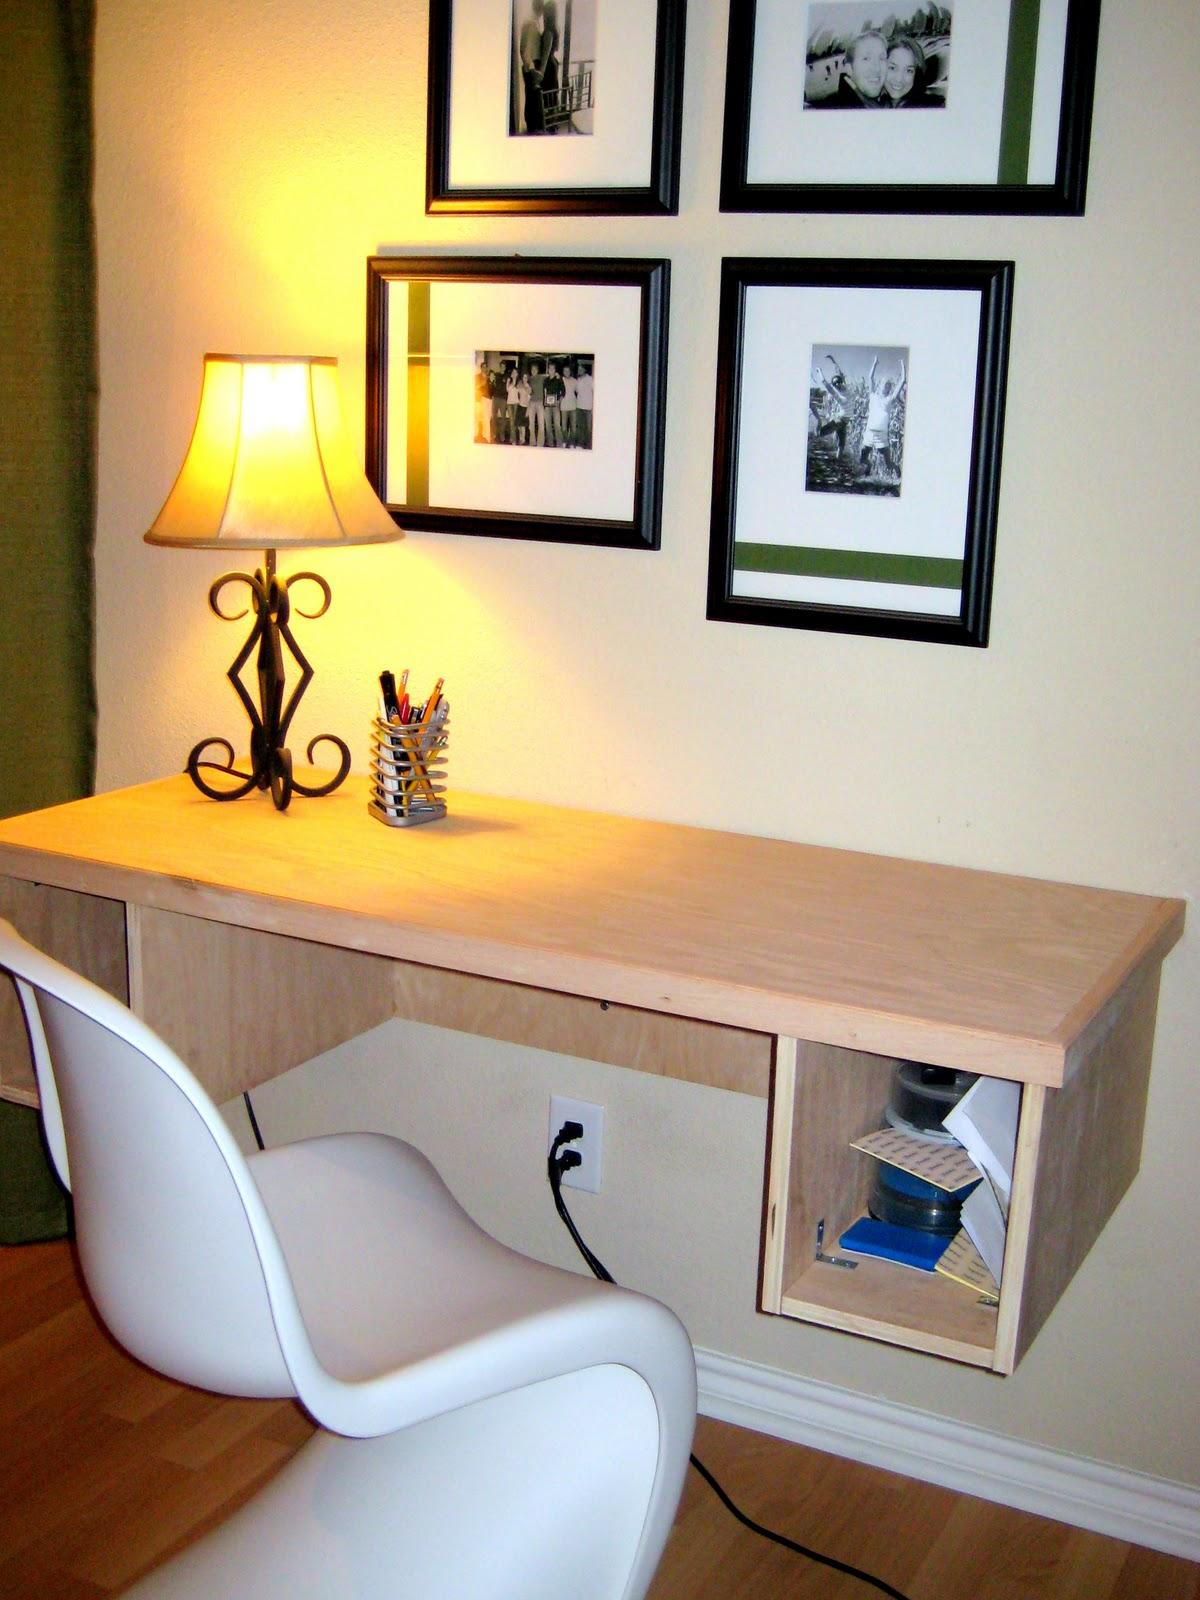 C.R.A.F.T. #71: Suspended Desk- Part 1 - C.R.A.F.T.